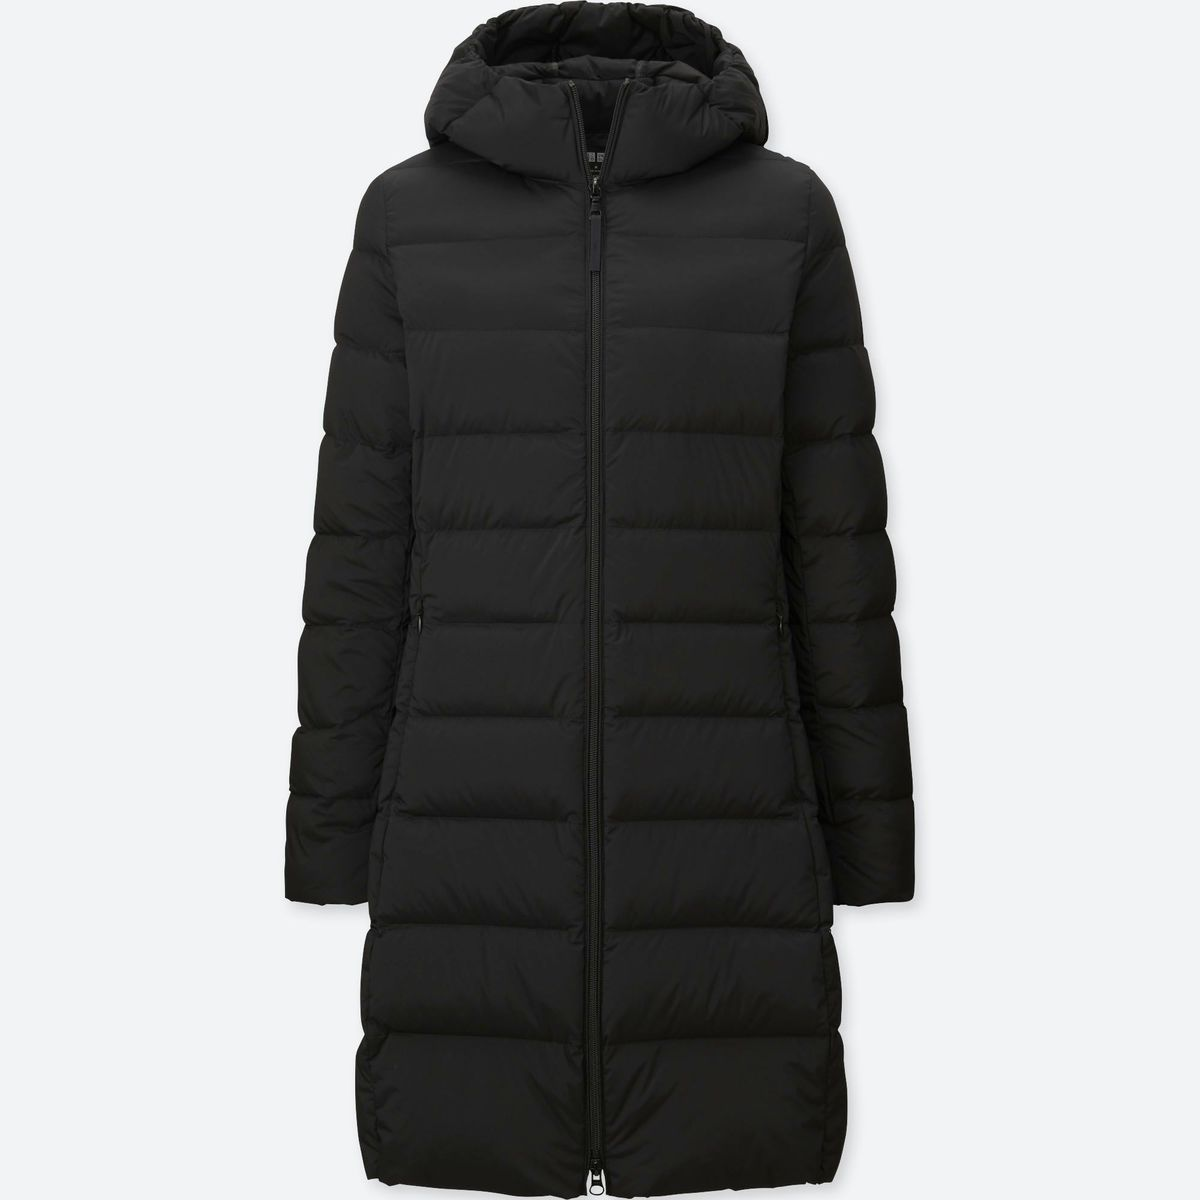 A black down jacket